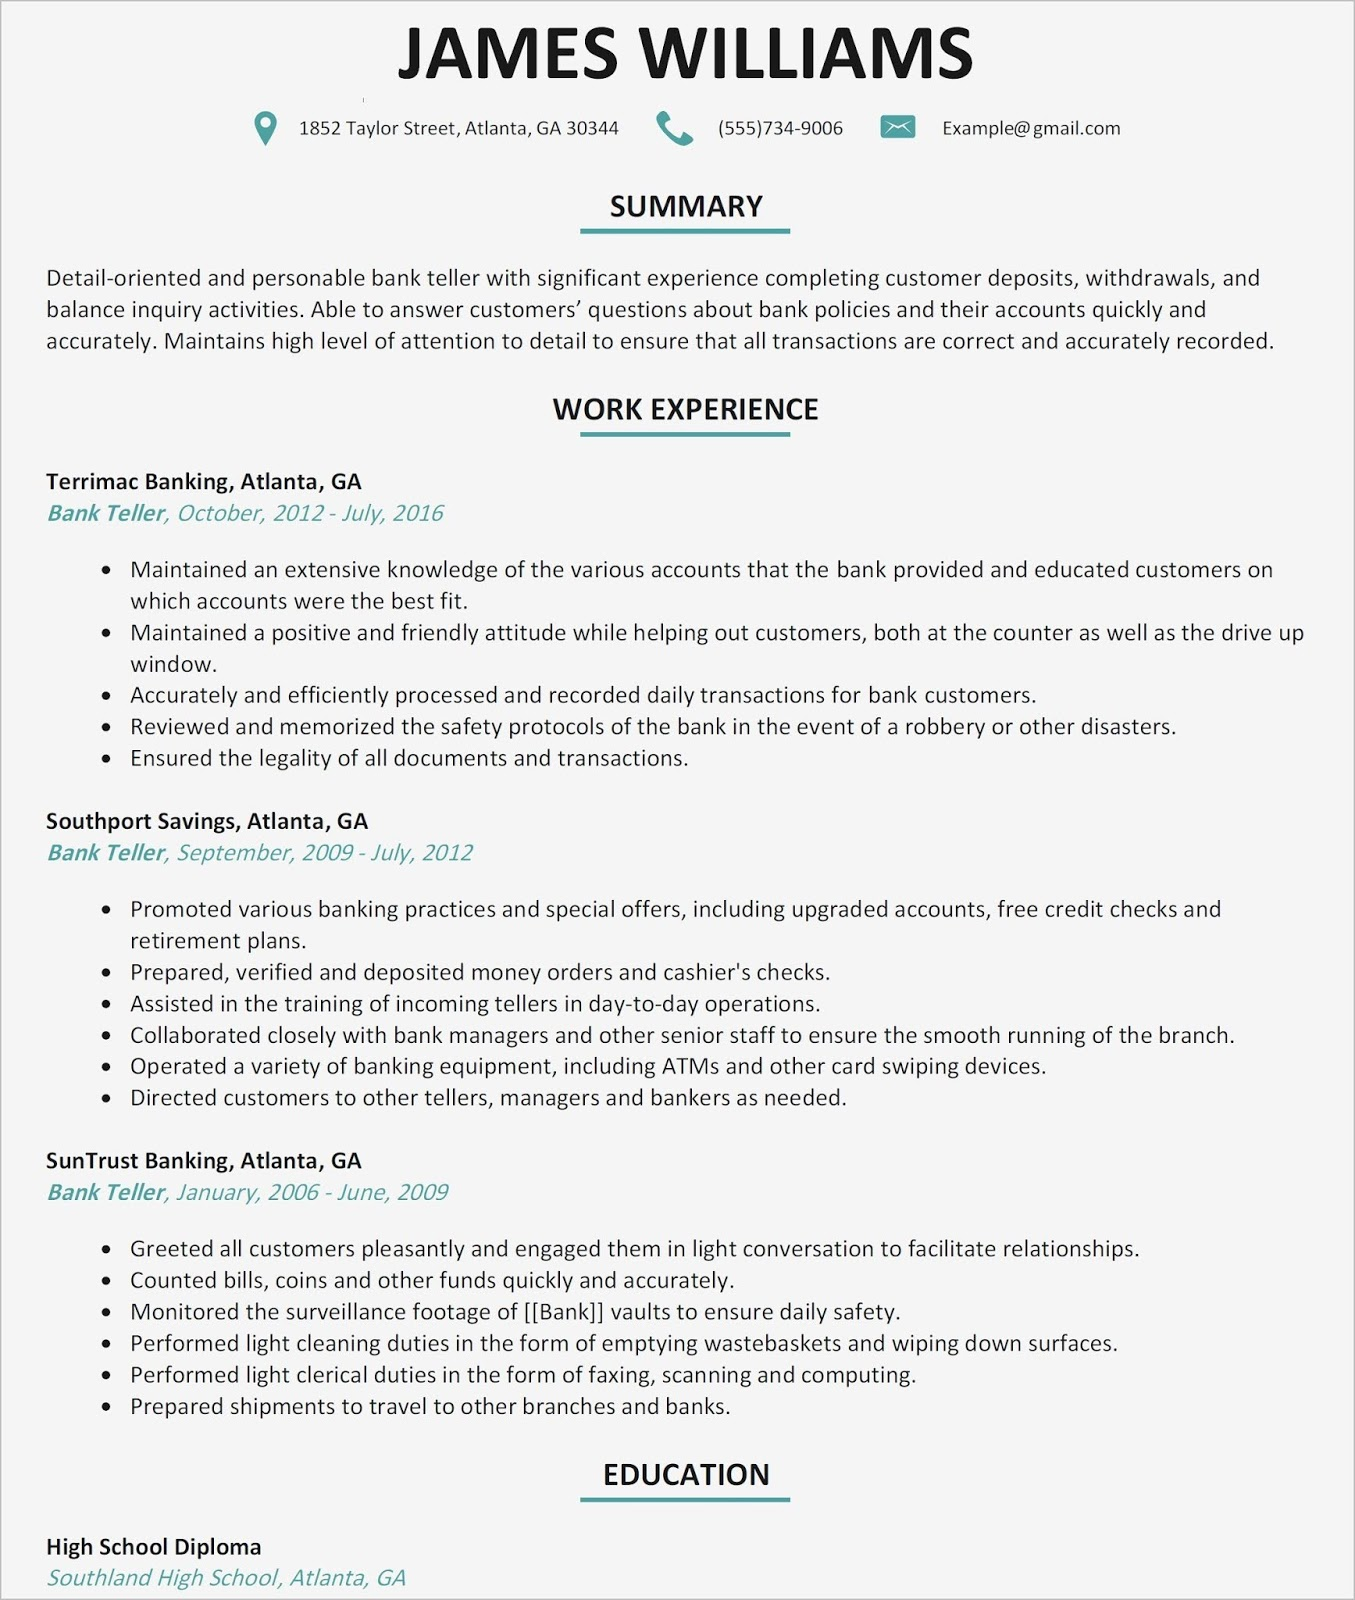 bank resume template download bank resume template for freshers world bank resume template bank teller resume template investment banking resume template bank manager resume template bank teller resume templates no experience bank teller resume templates free download bank job resume templates bank executive